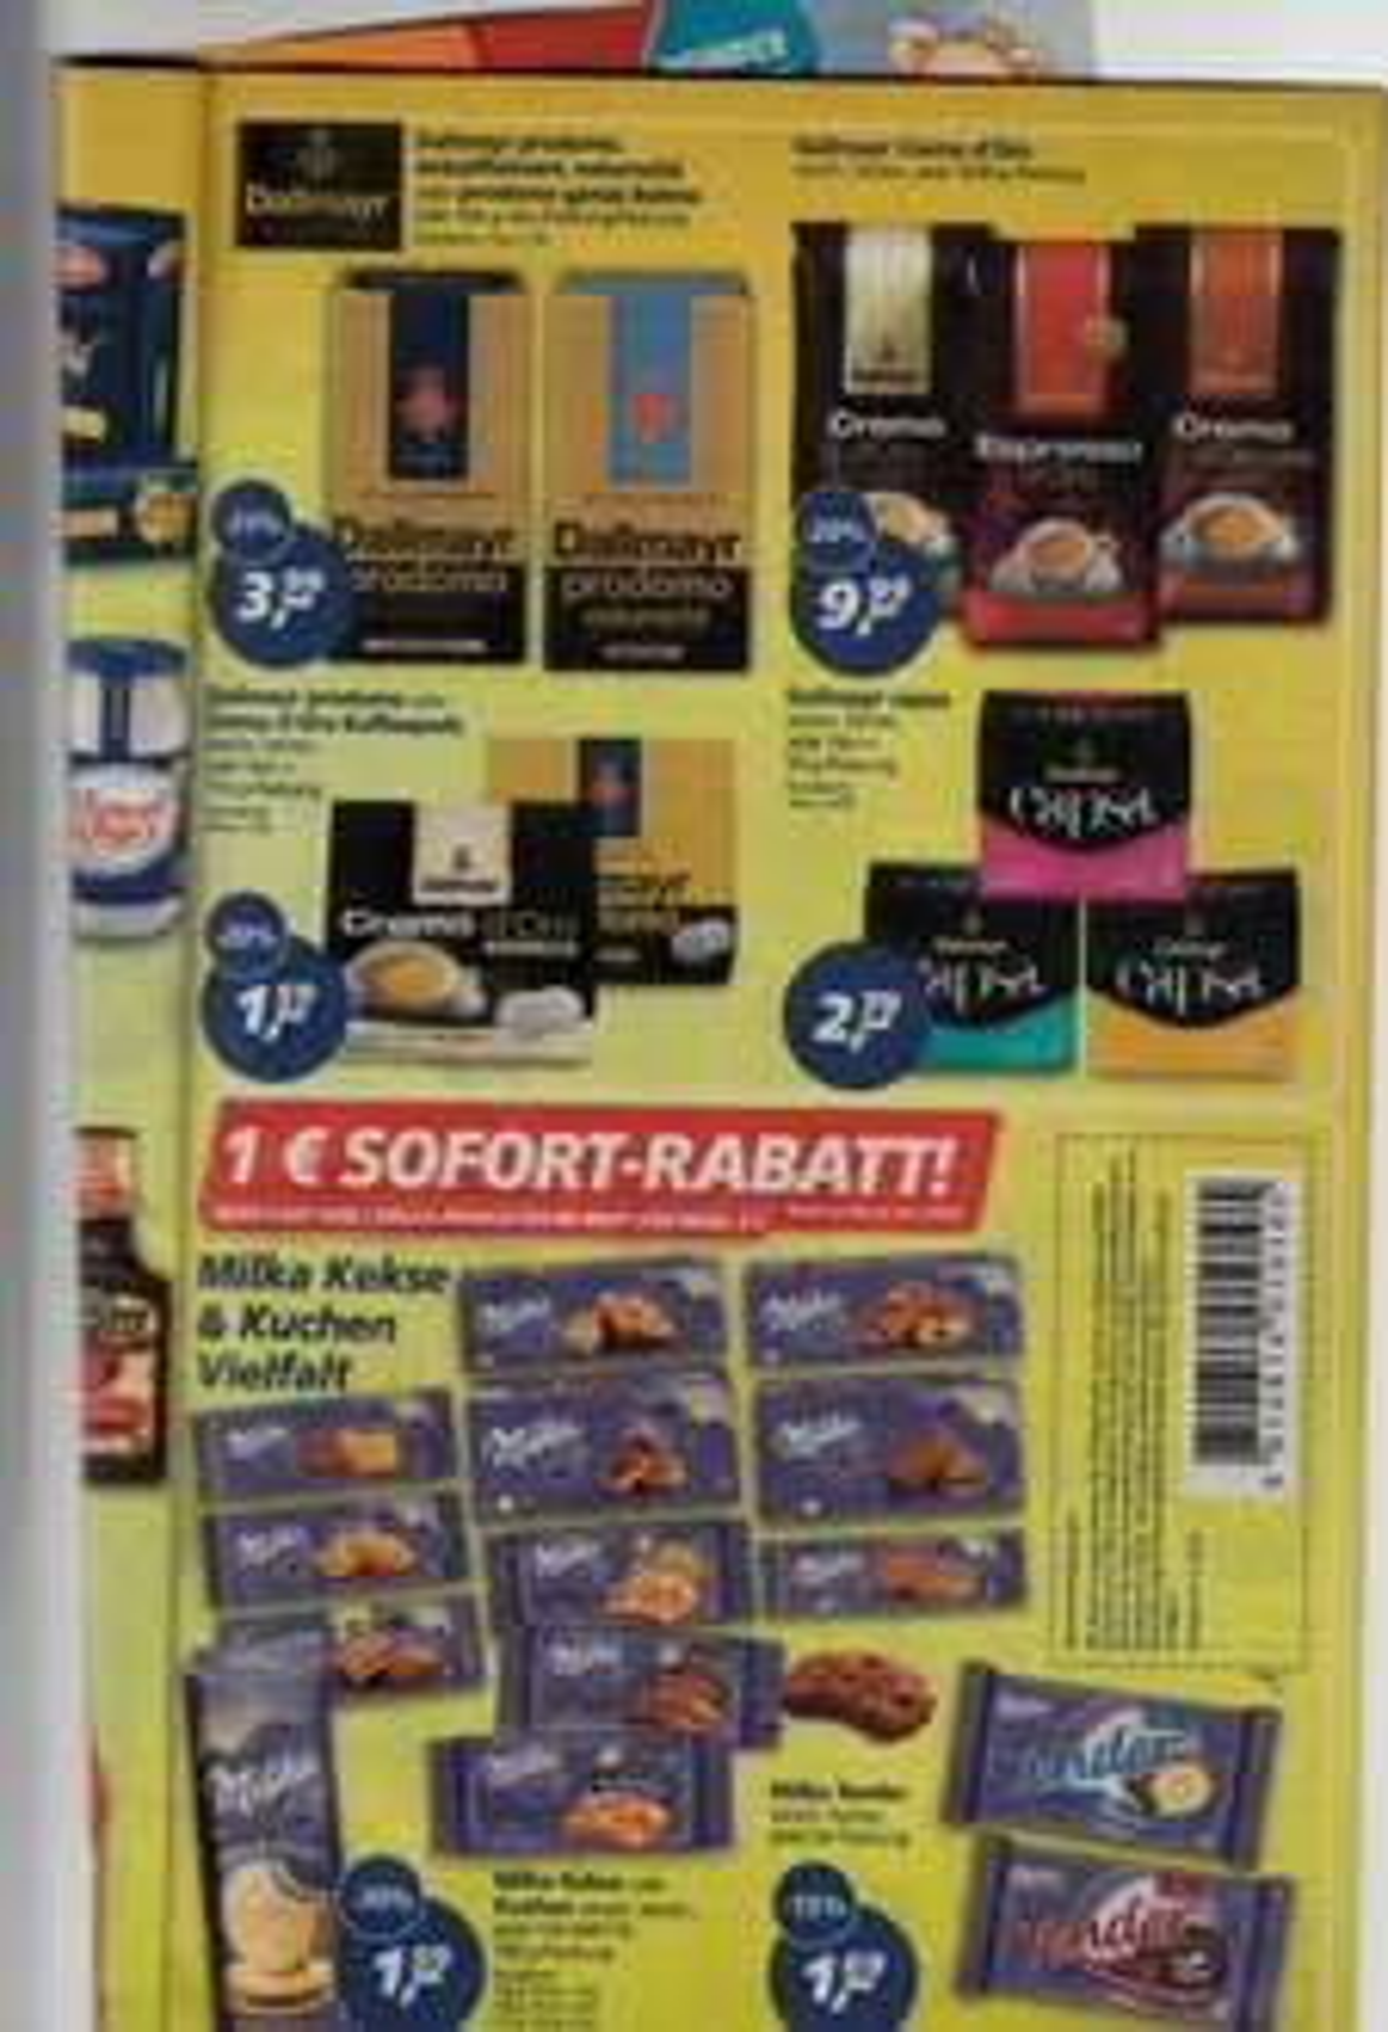 Real - Milka Aktion 5 Euro = 1 Euro Rabatt